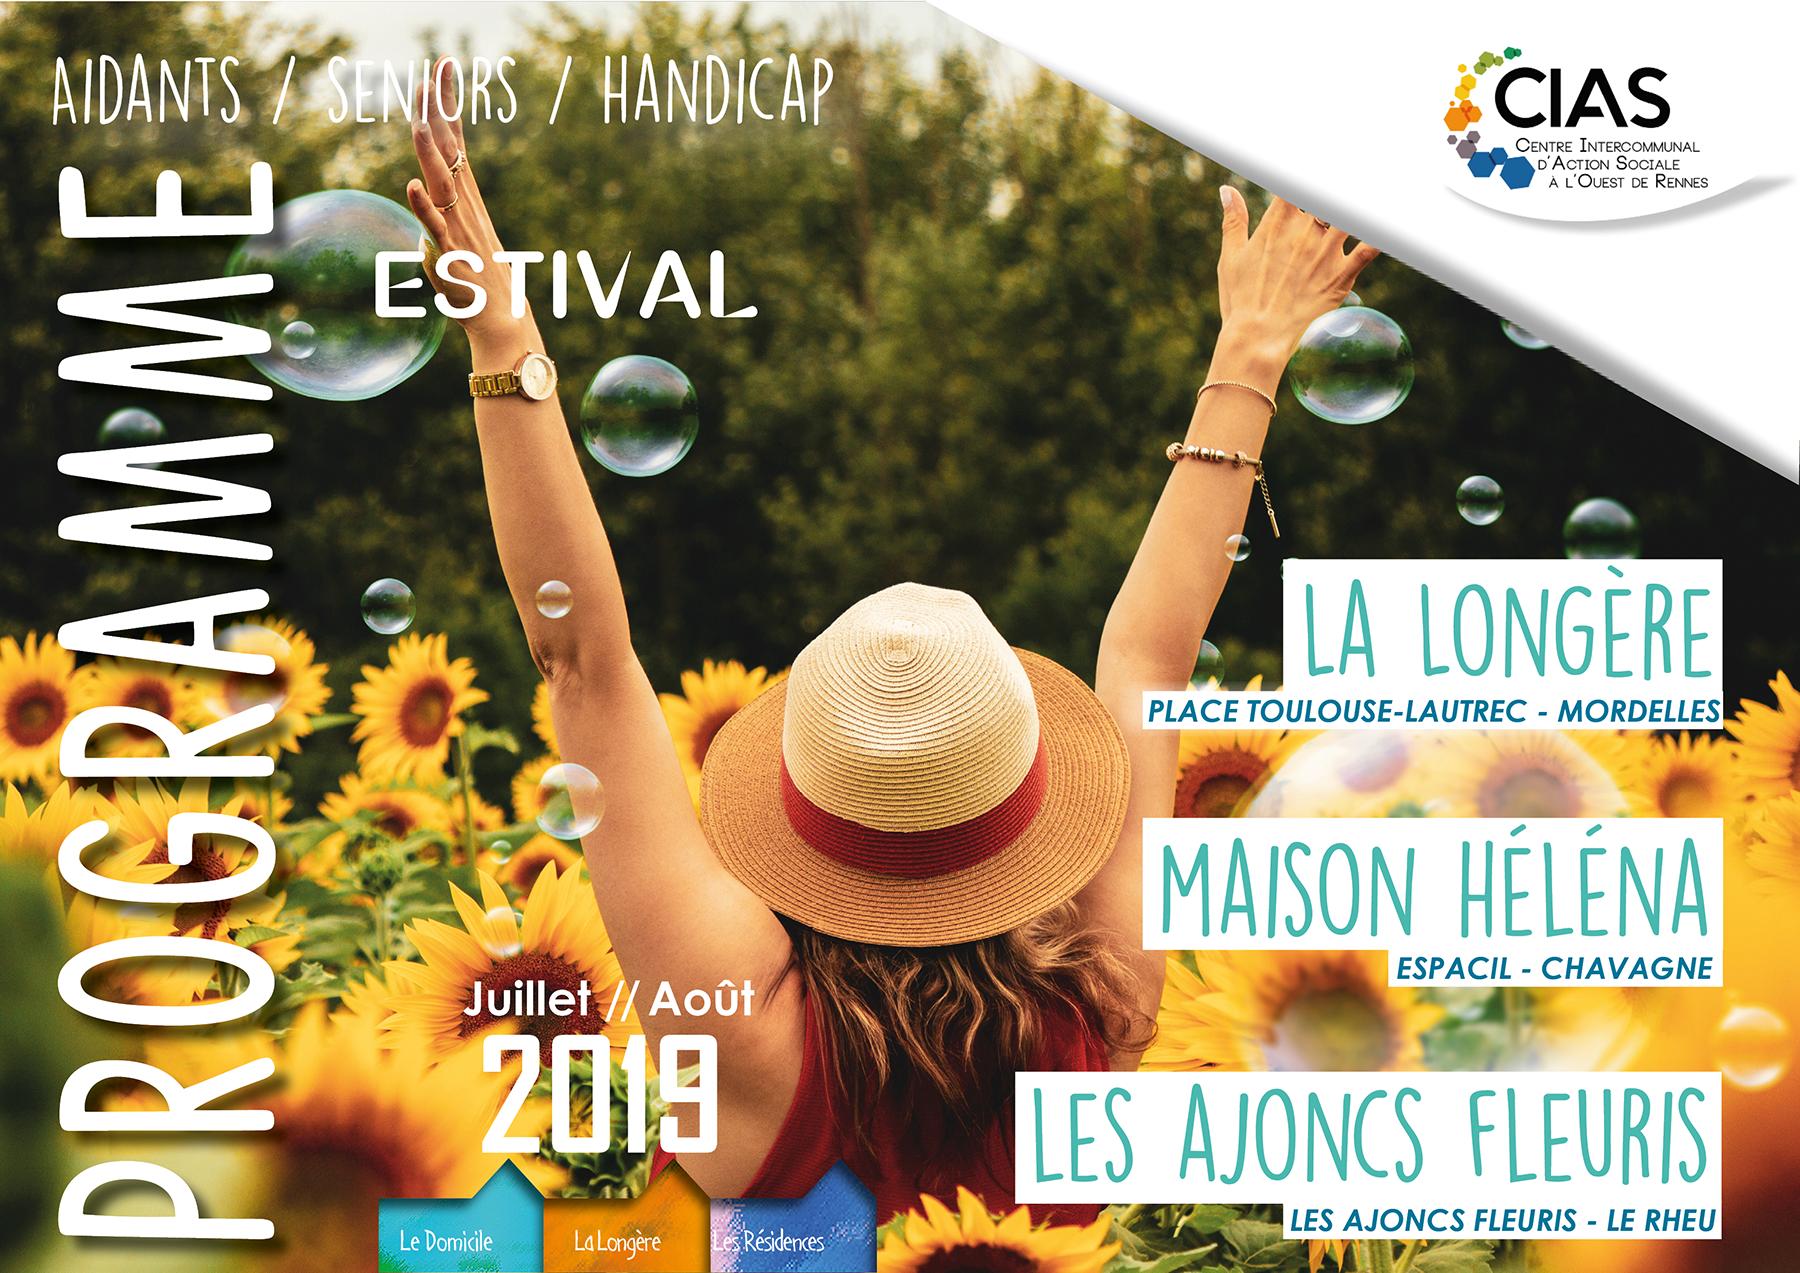 Juillet -Août Programme La Longère 2019